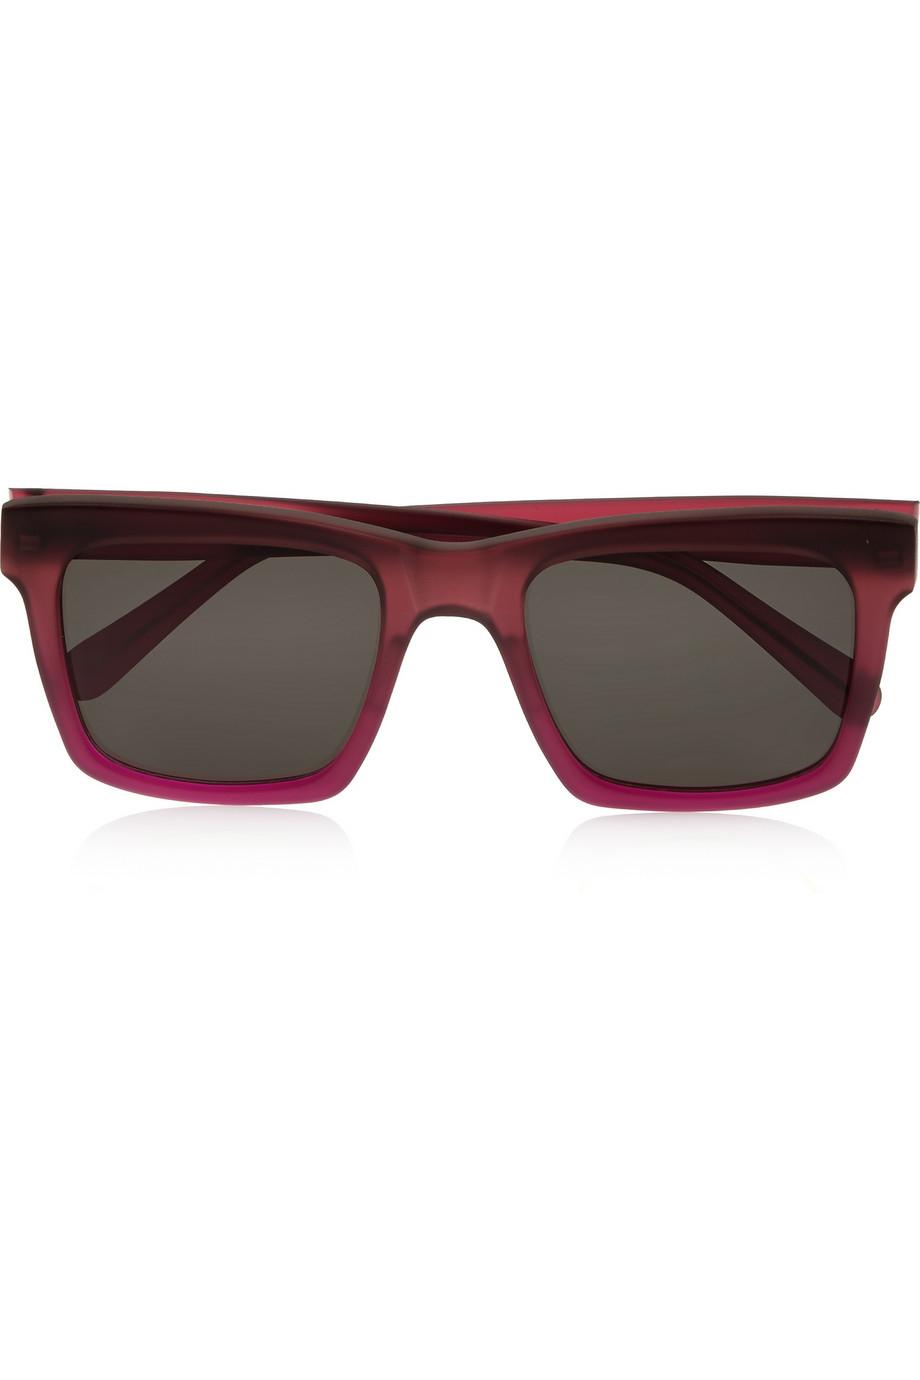 Prism Milan Square-Frame Acetate Sunglasses in Purple